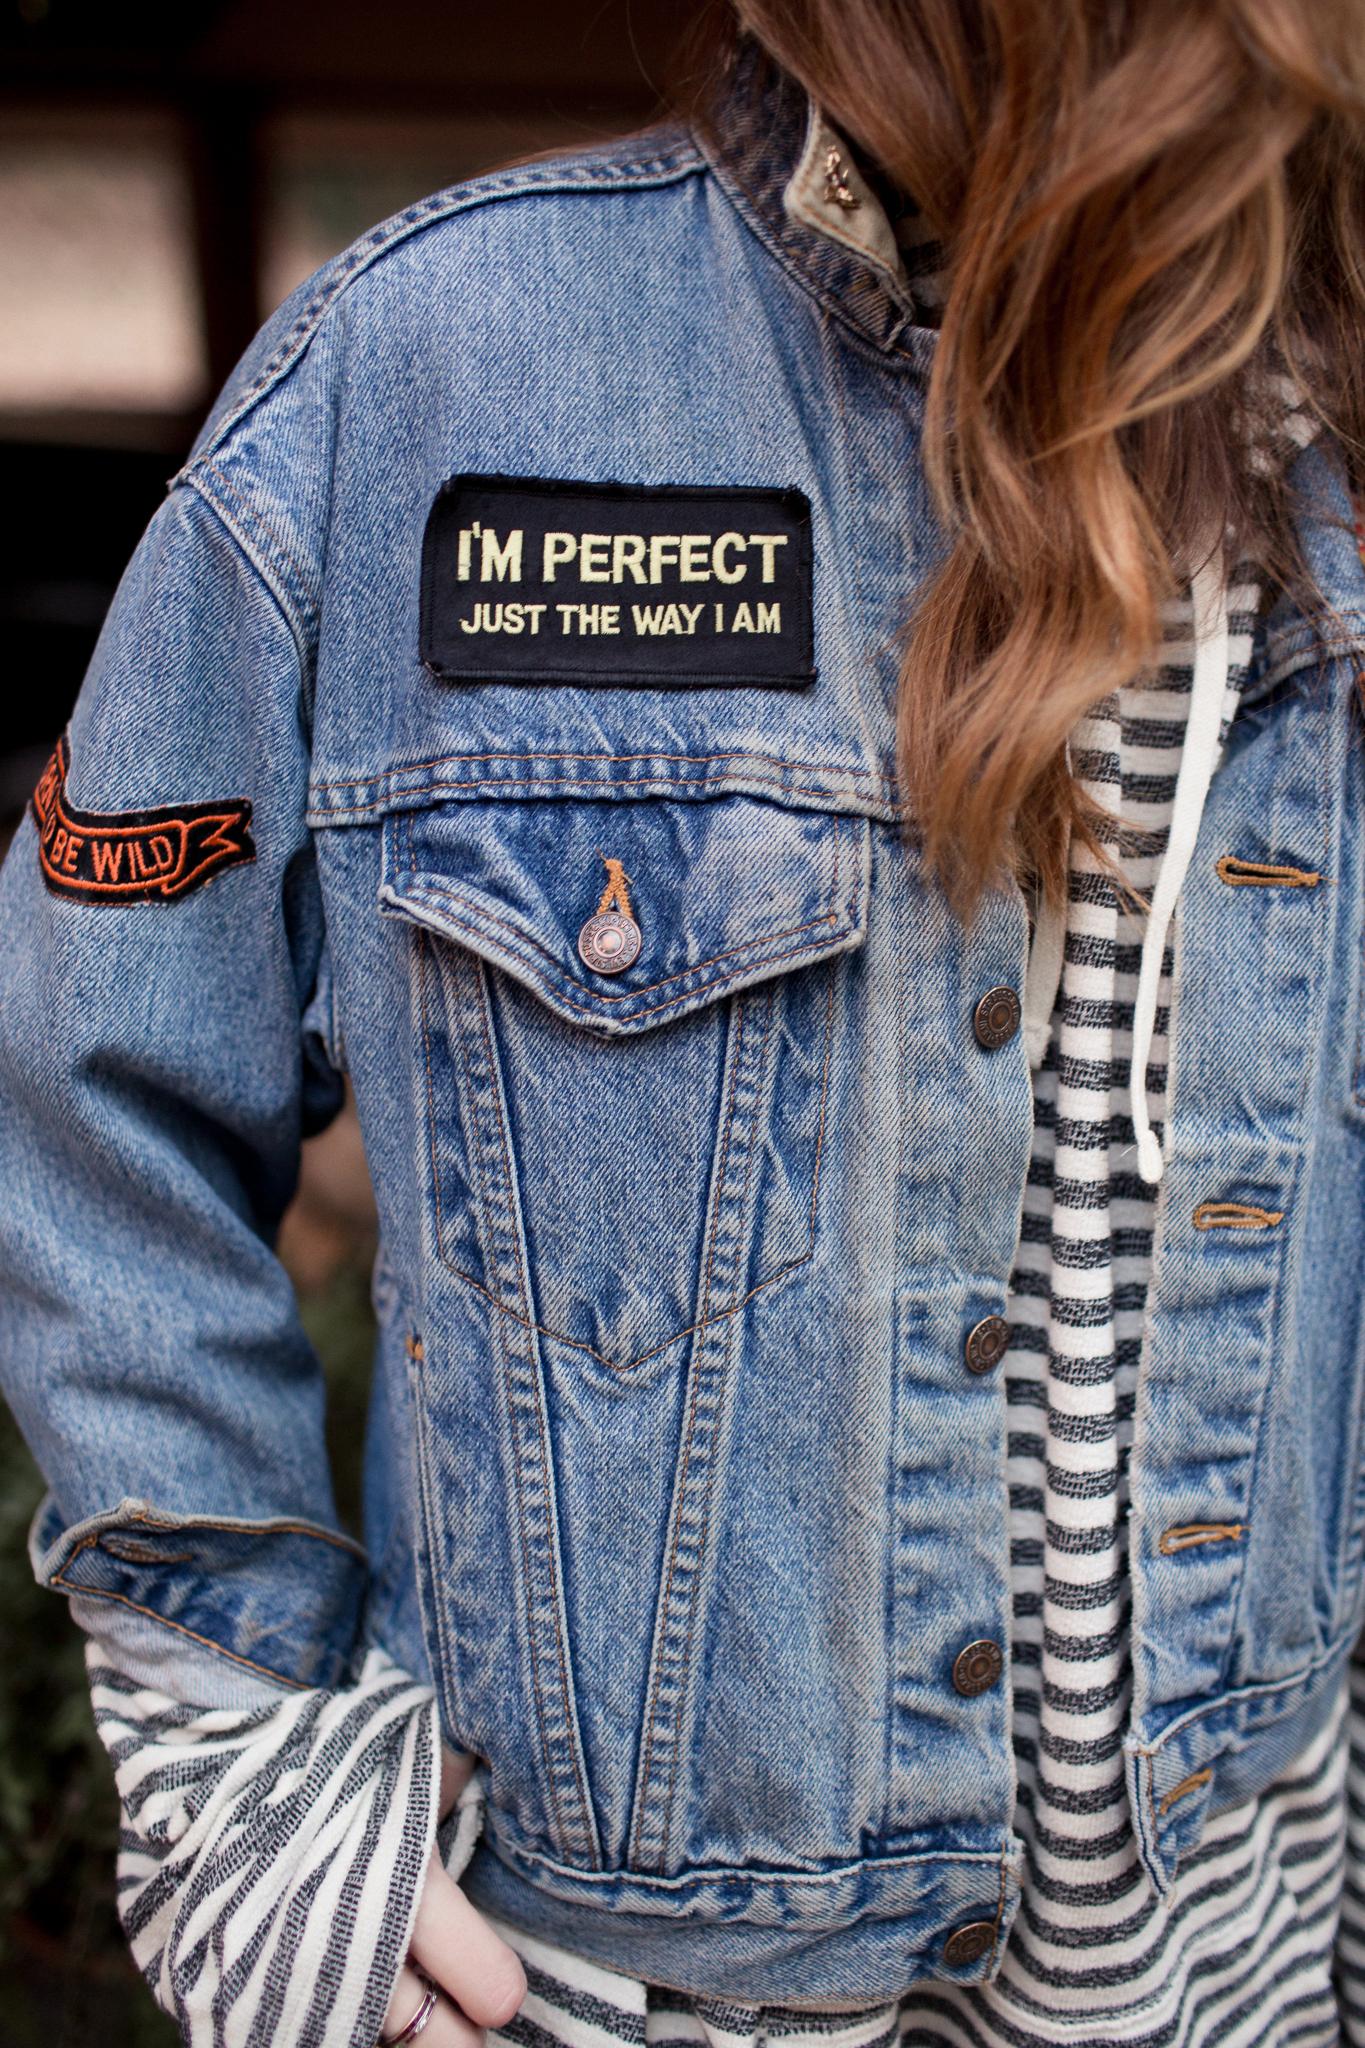 Eldridge Edit-Anna_Cottrell_Fashion_Blogger_Winter_2017_Jean_Denim_Jacket_Patches_Striped_Oversized_Hoodie_Ralph_Lauren_Black_Over_the_Knee_OTK_Boots_MGB_Photo_2.jpg